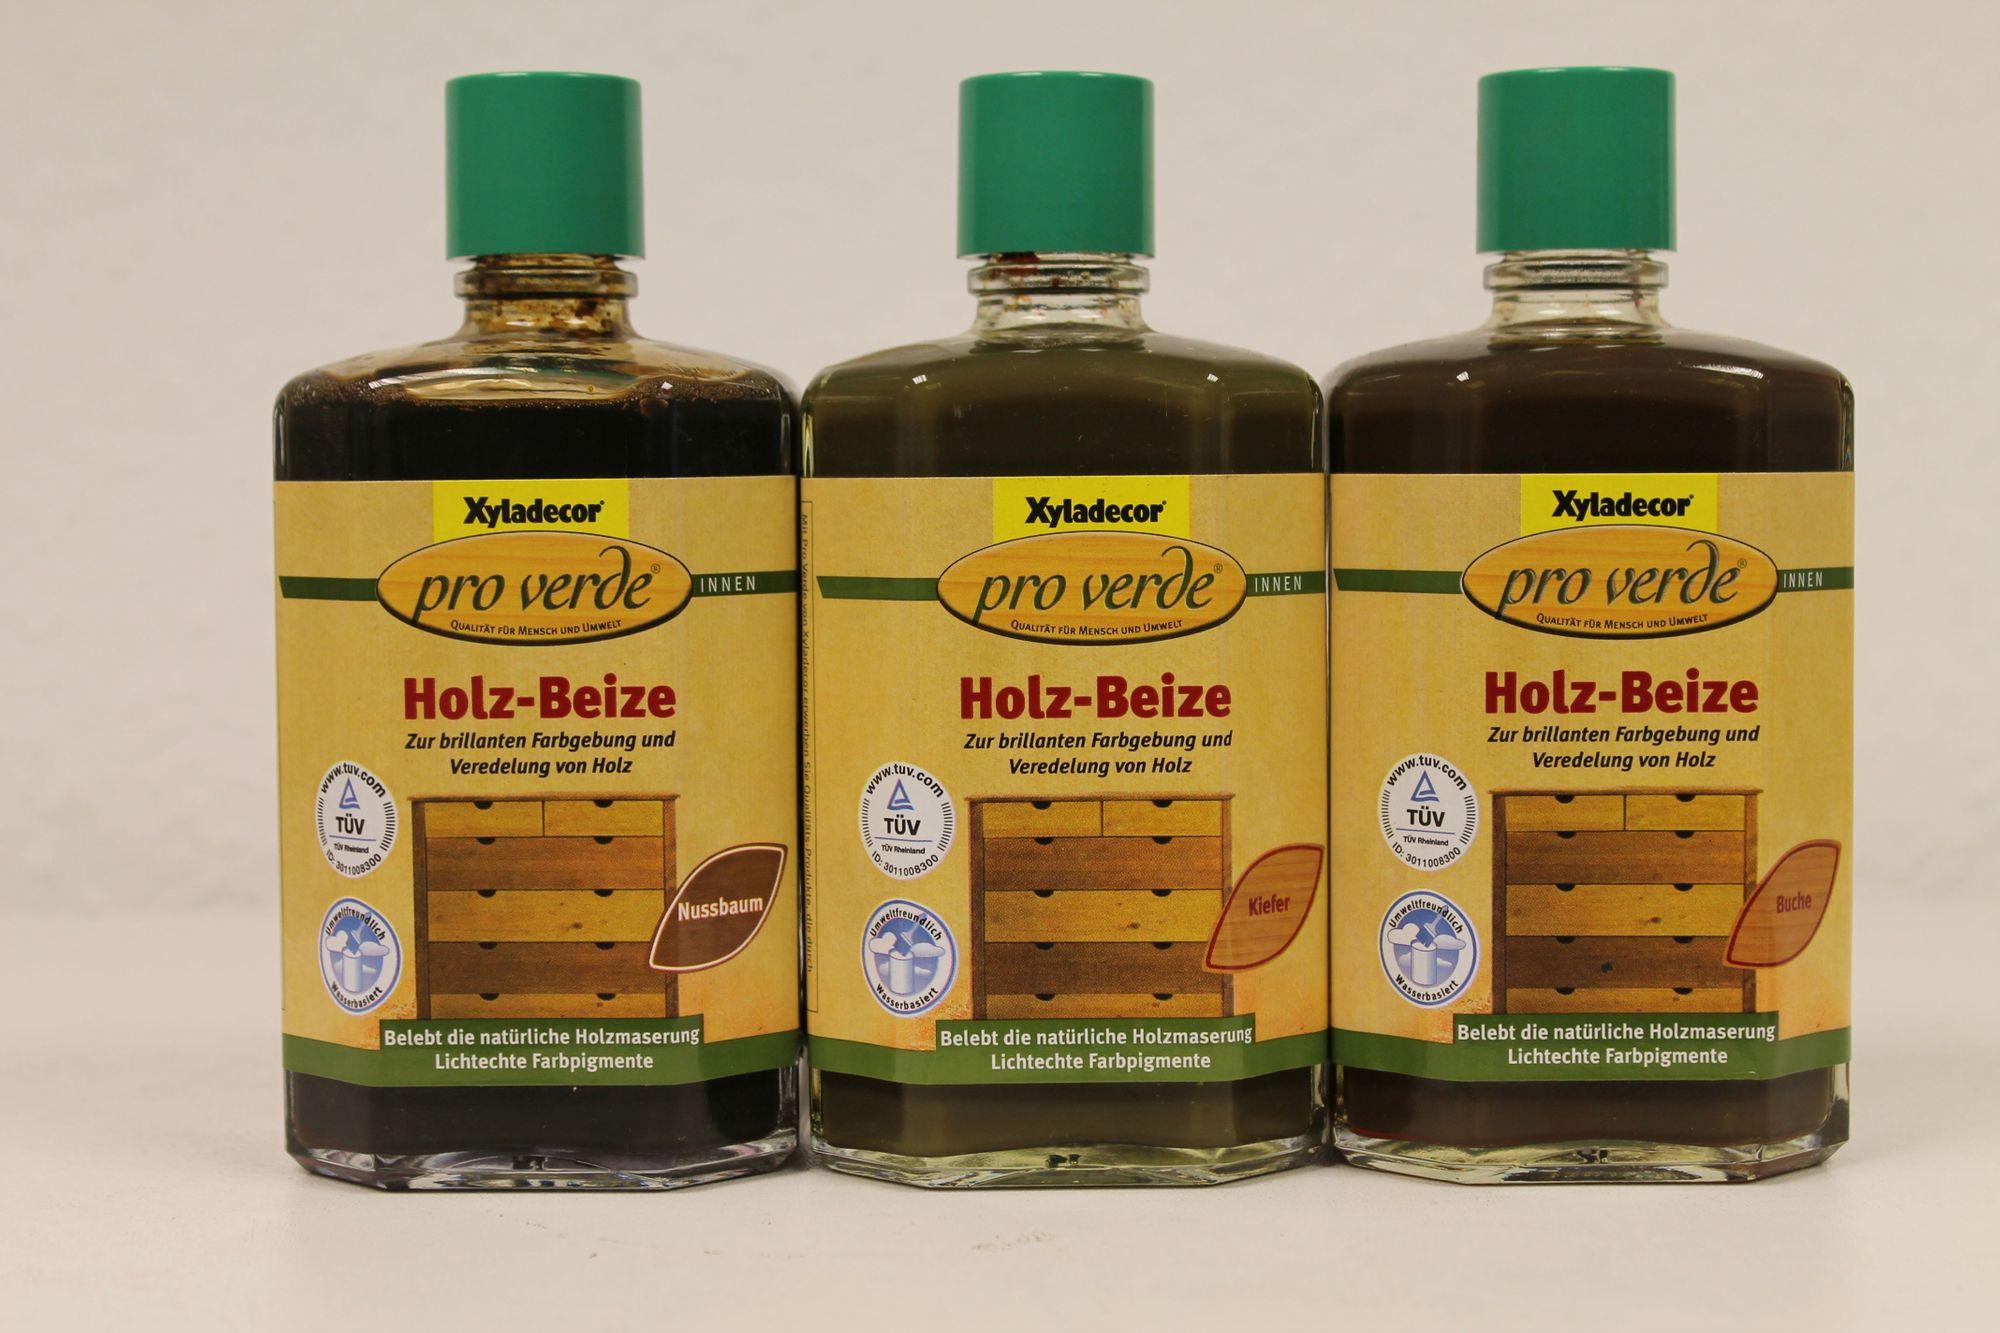 2 x 0,25 Liter Xyladecor  Pro Verde  Holzbeize Farbwahl 0,5 Liter